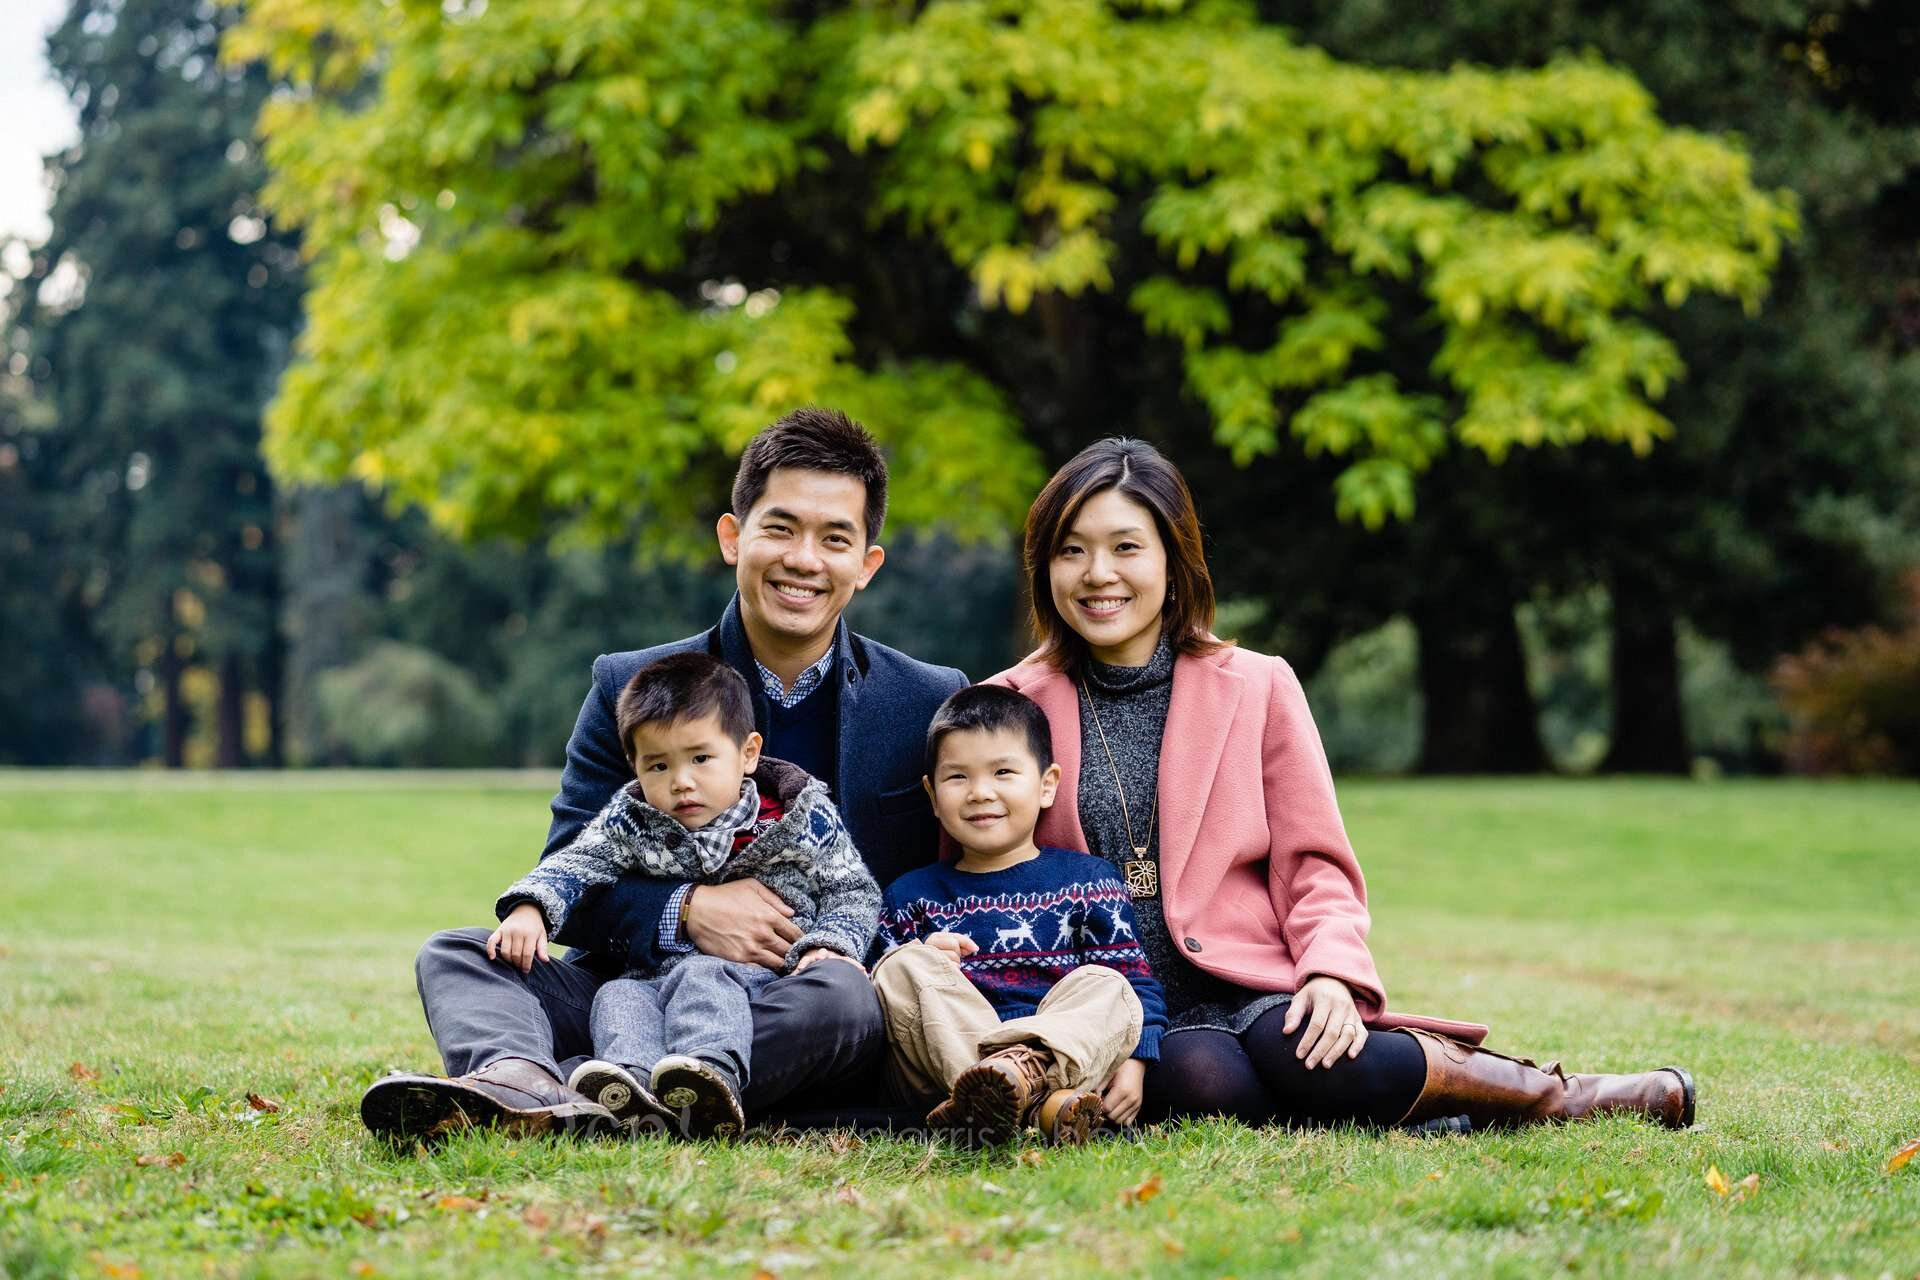 006-redmond-family-portrait-photography.jpg